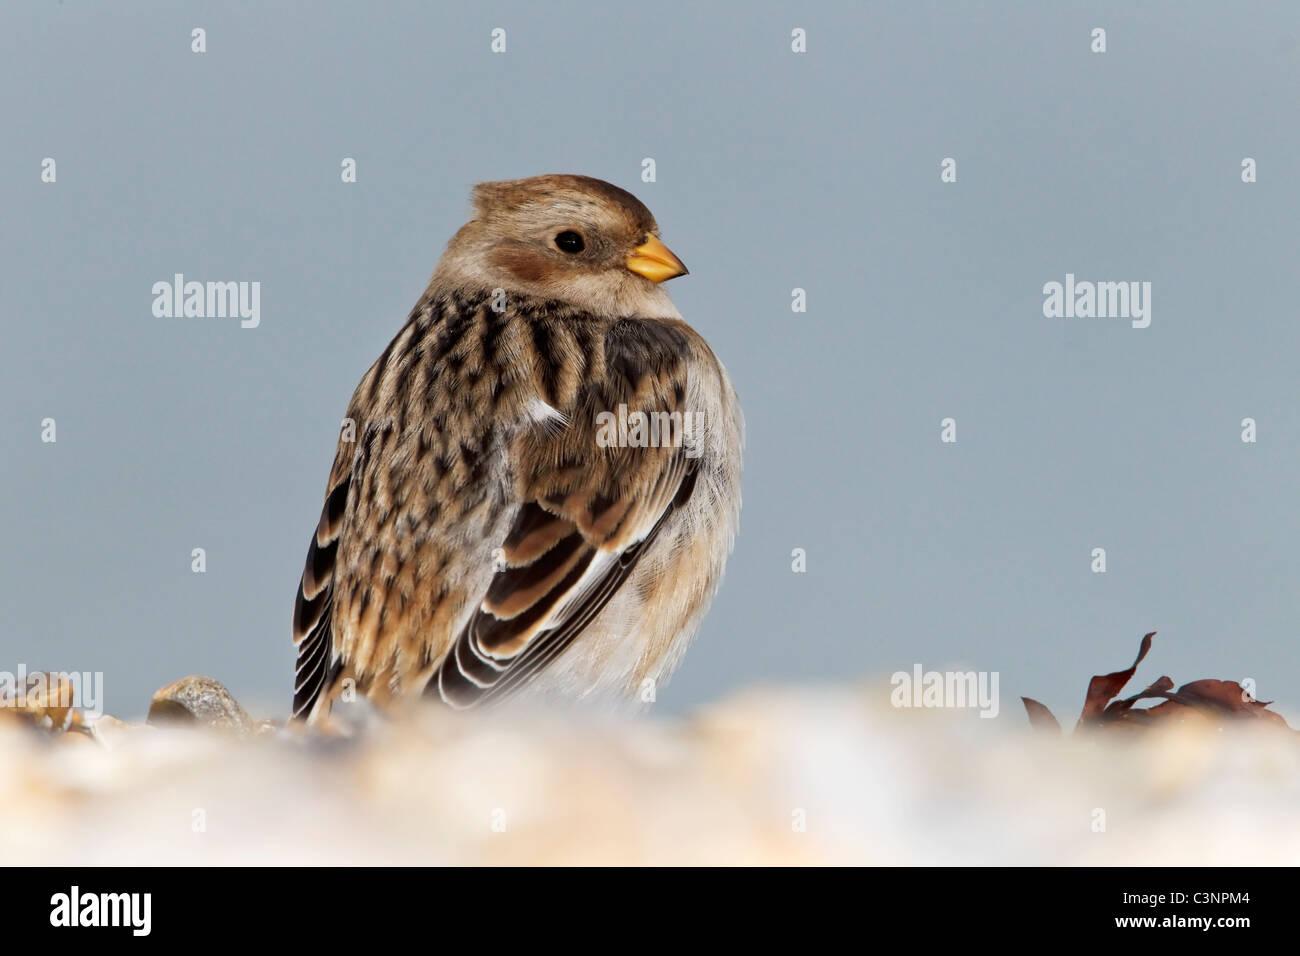 A winter plumage Snow Bunting stood on a shingle beach - Stock Image